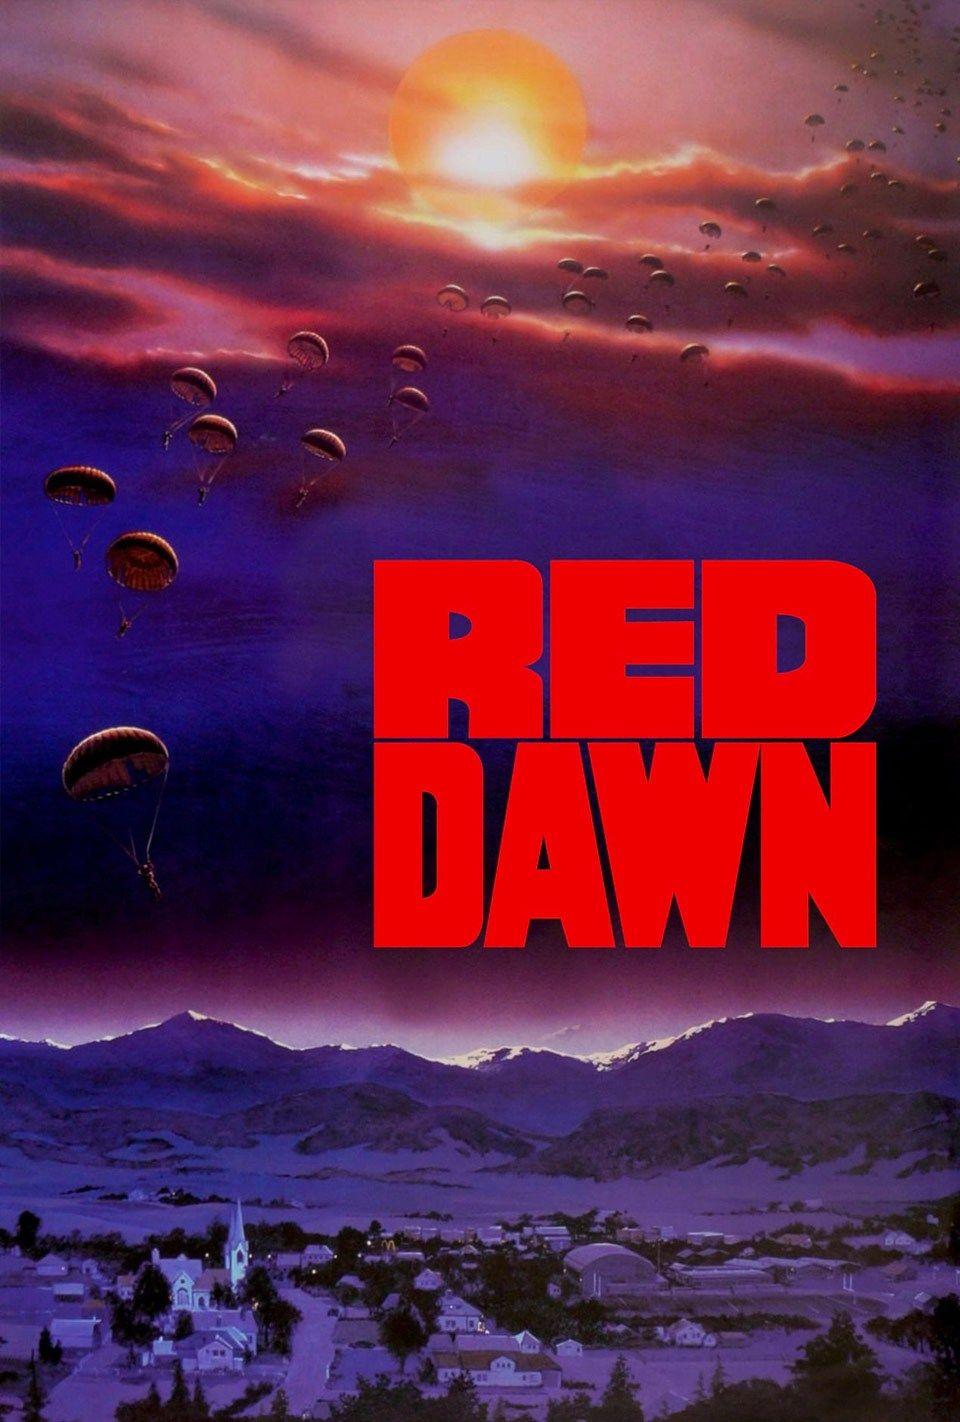 red dawn 1984 movie script